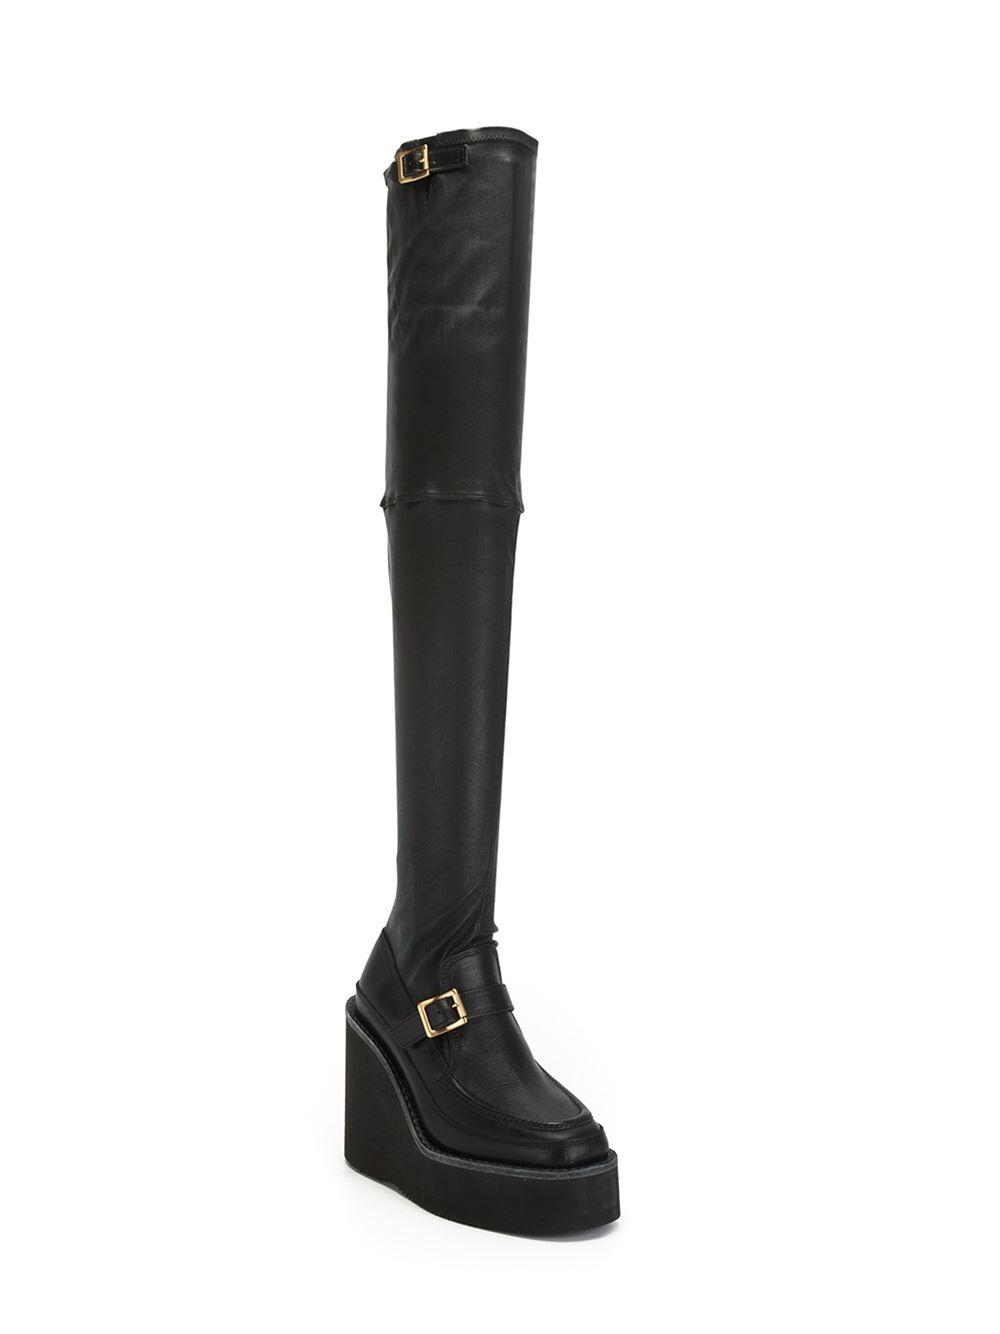 Sacai Black Over-the-Knee Sock Rain Boots 6Ts07